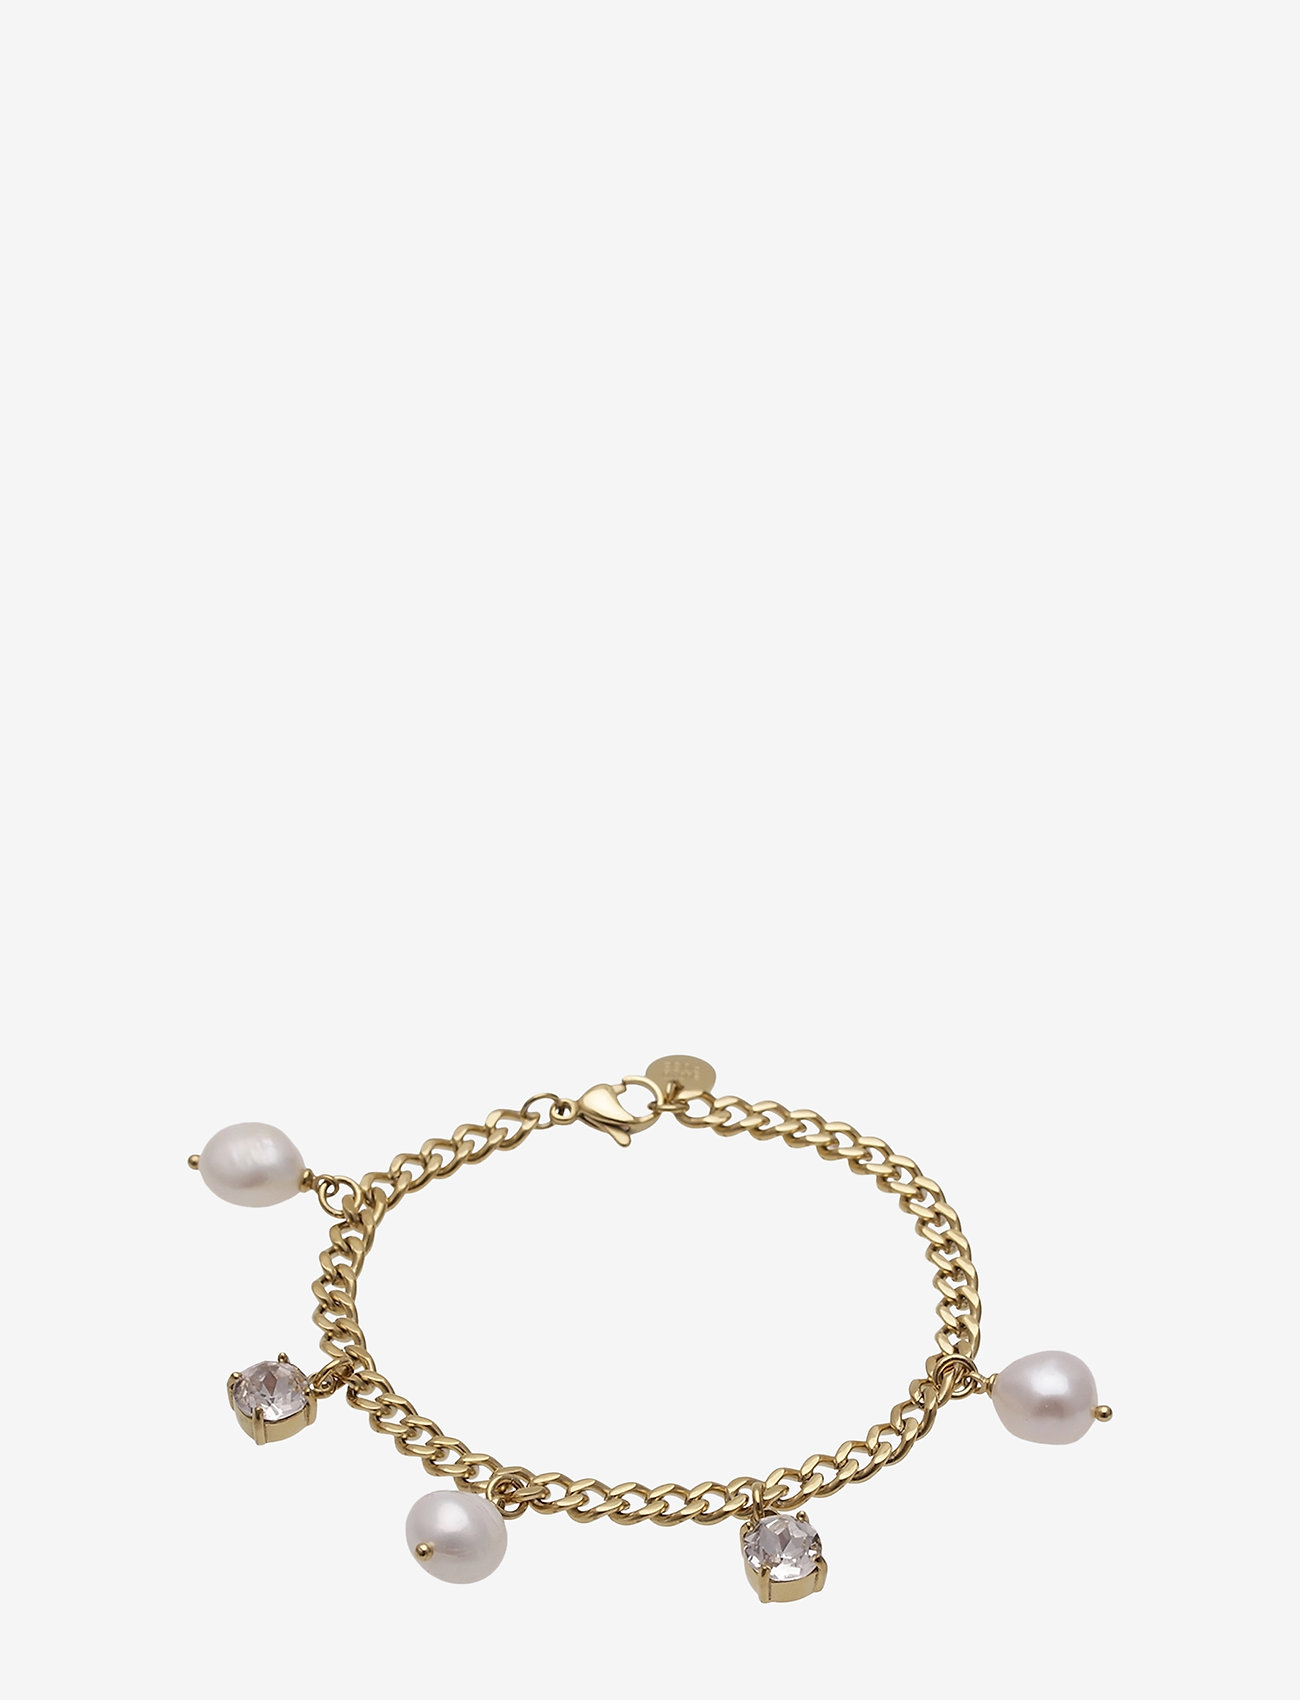 Bud to rose - Pearl Charm Bracelet Steel - dainty - gold - 0